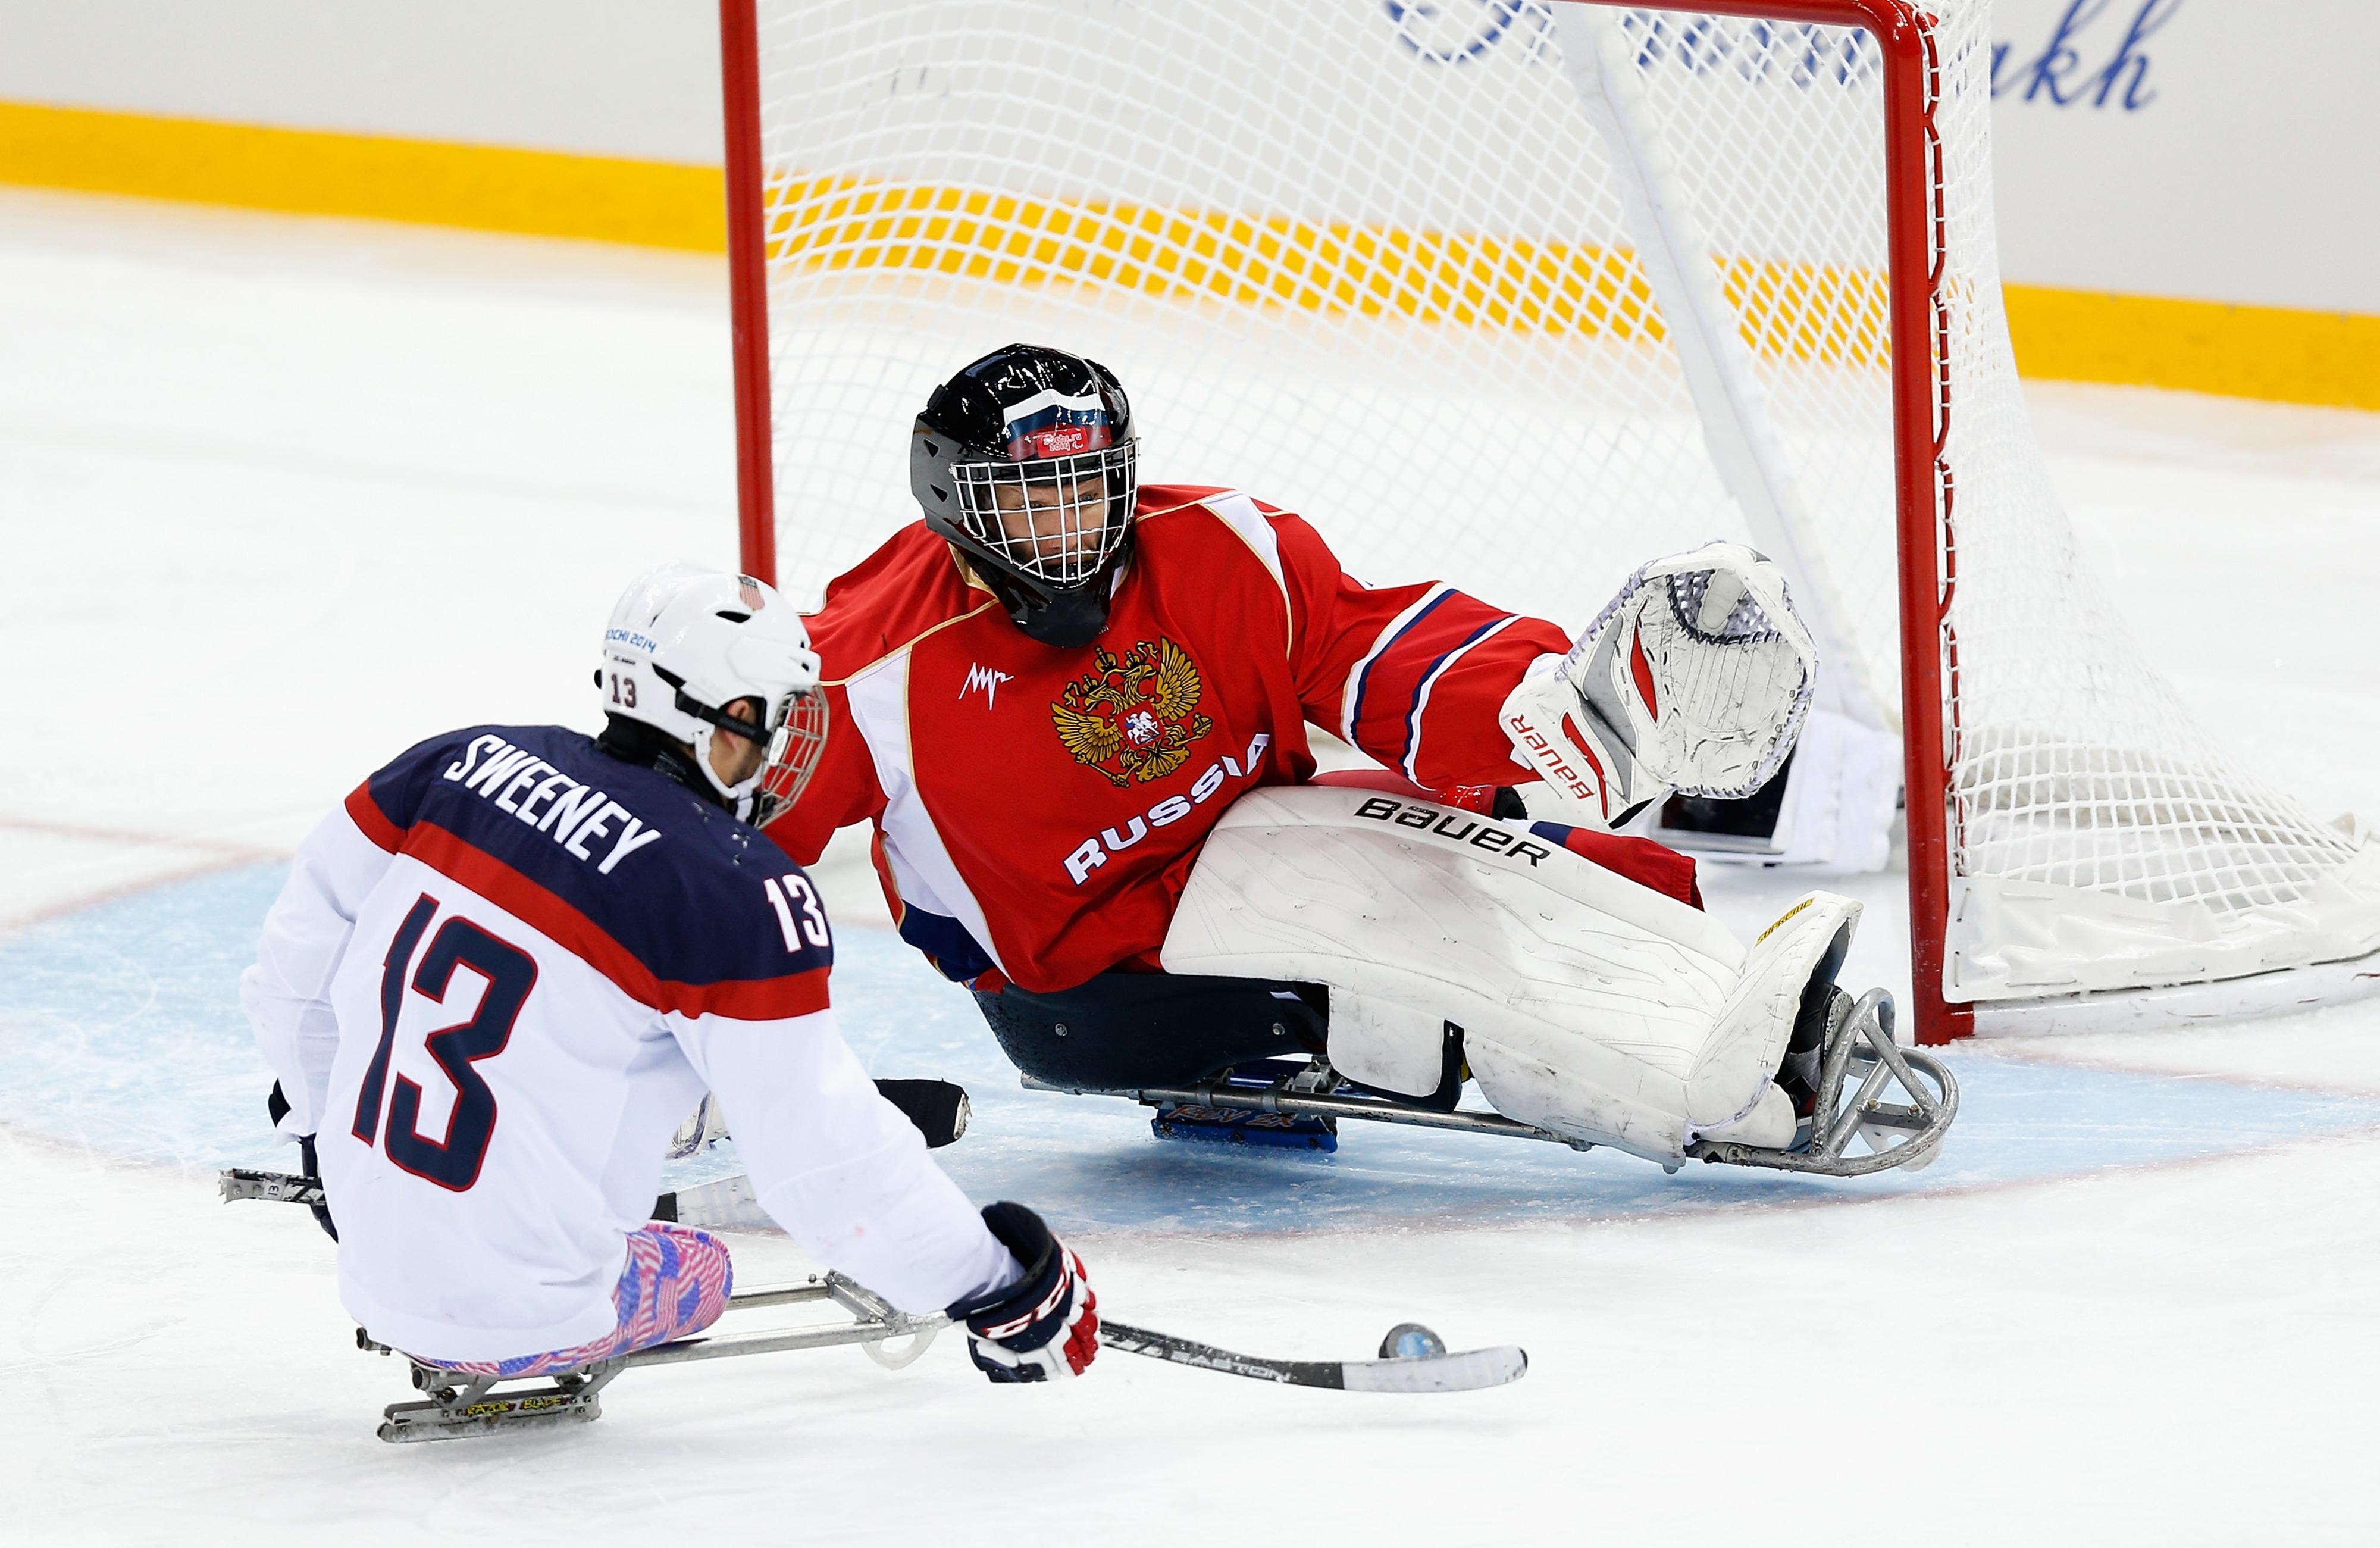 This is not Ilya Sorokin. But it is a Russian goaltender.